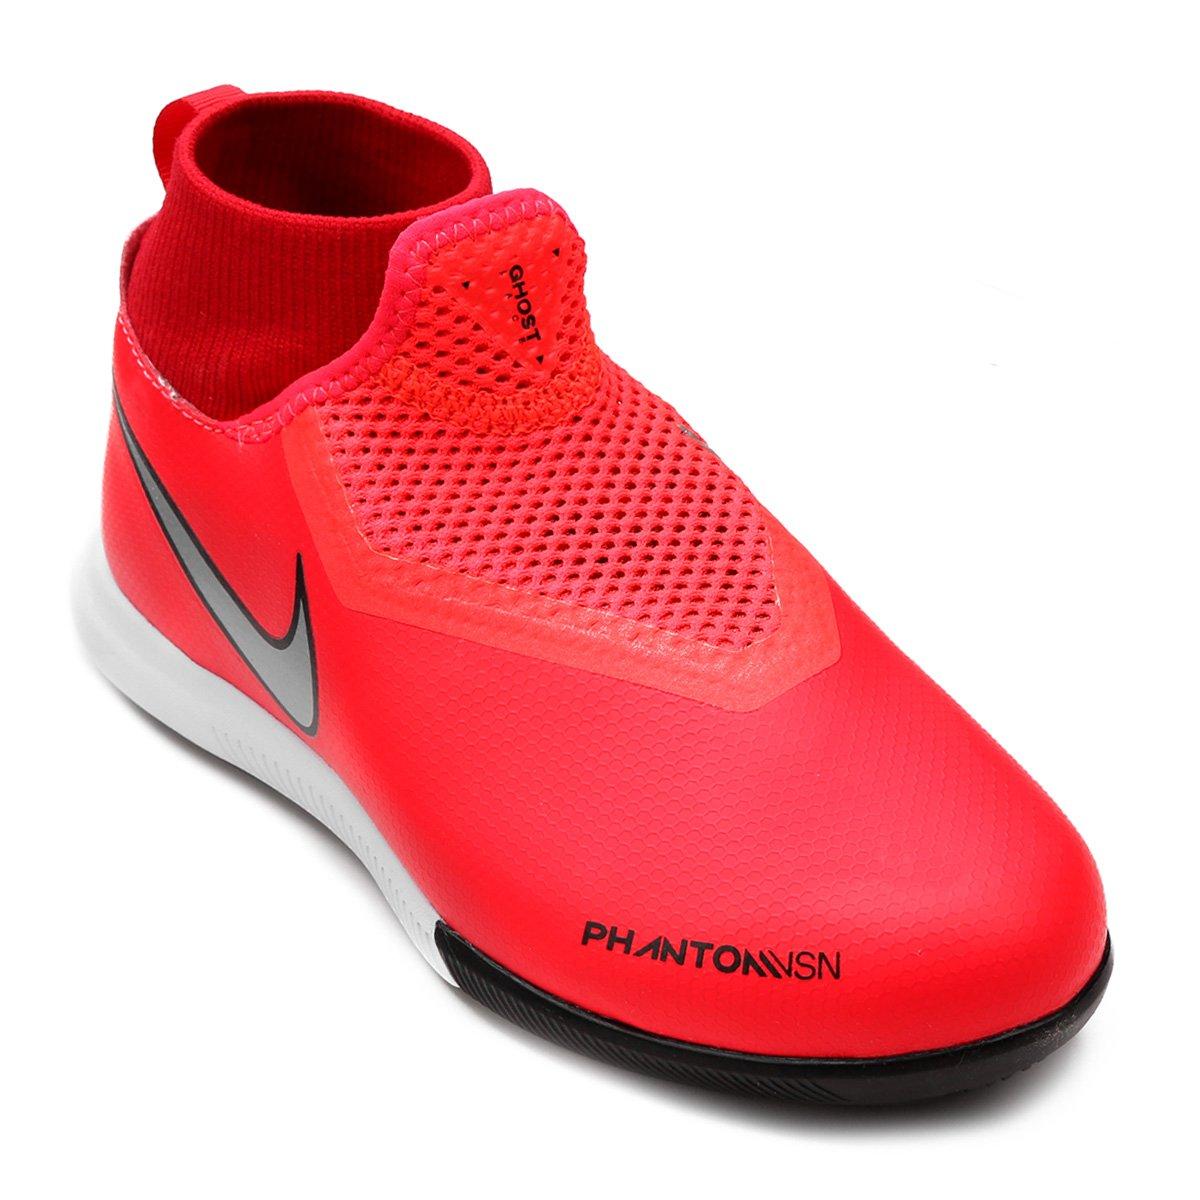 05294bc832 Chuteira Futsal Infantil Nike Phantom Vision Academy DF IC - Compre ...